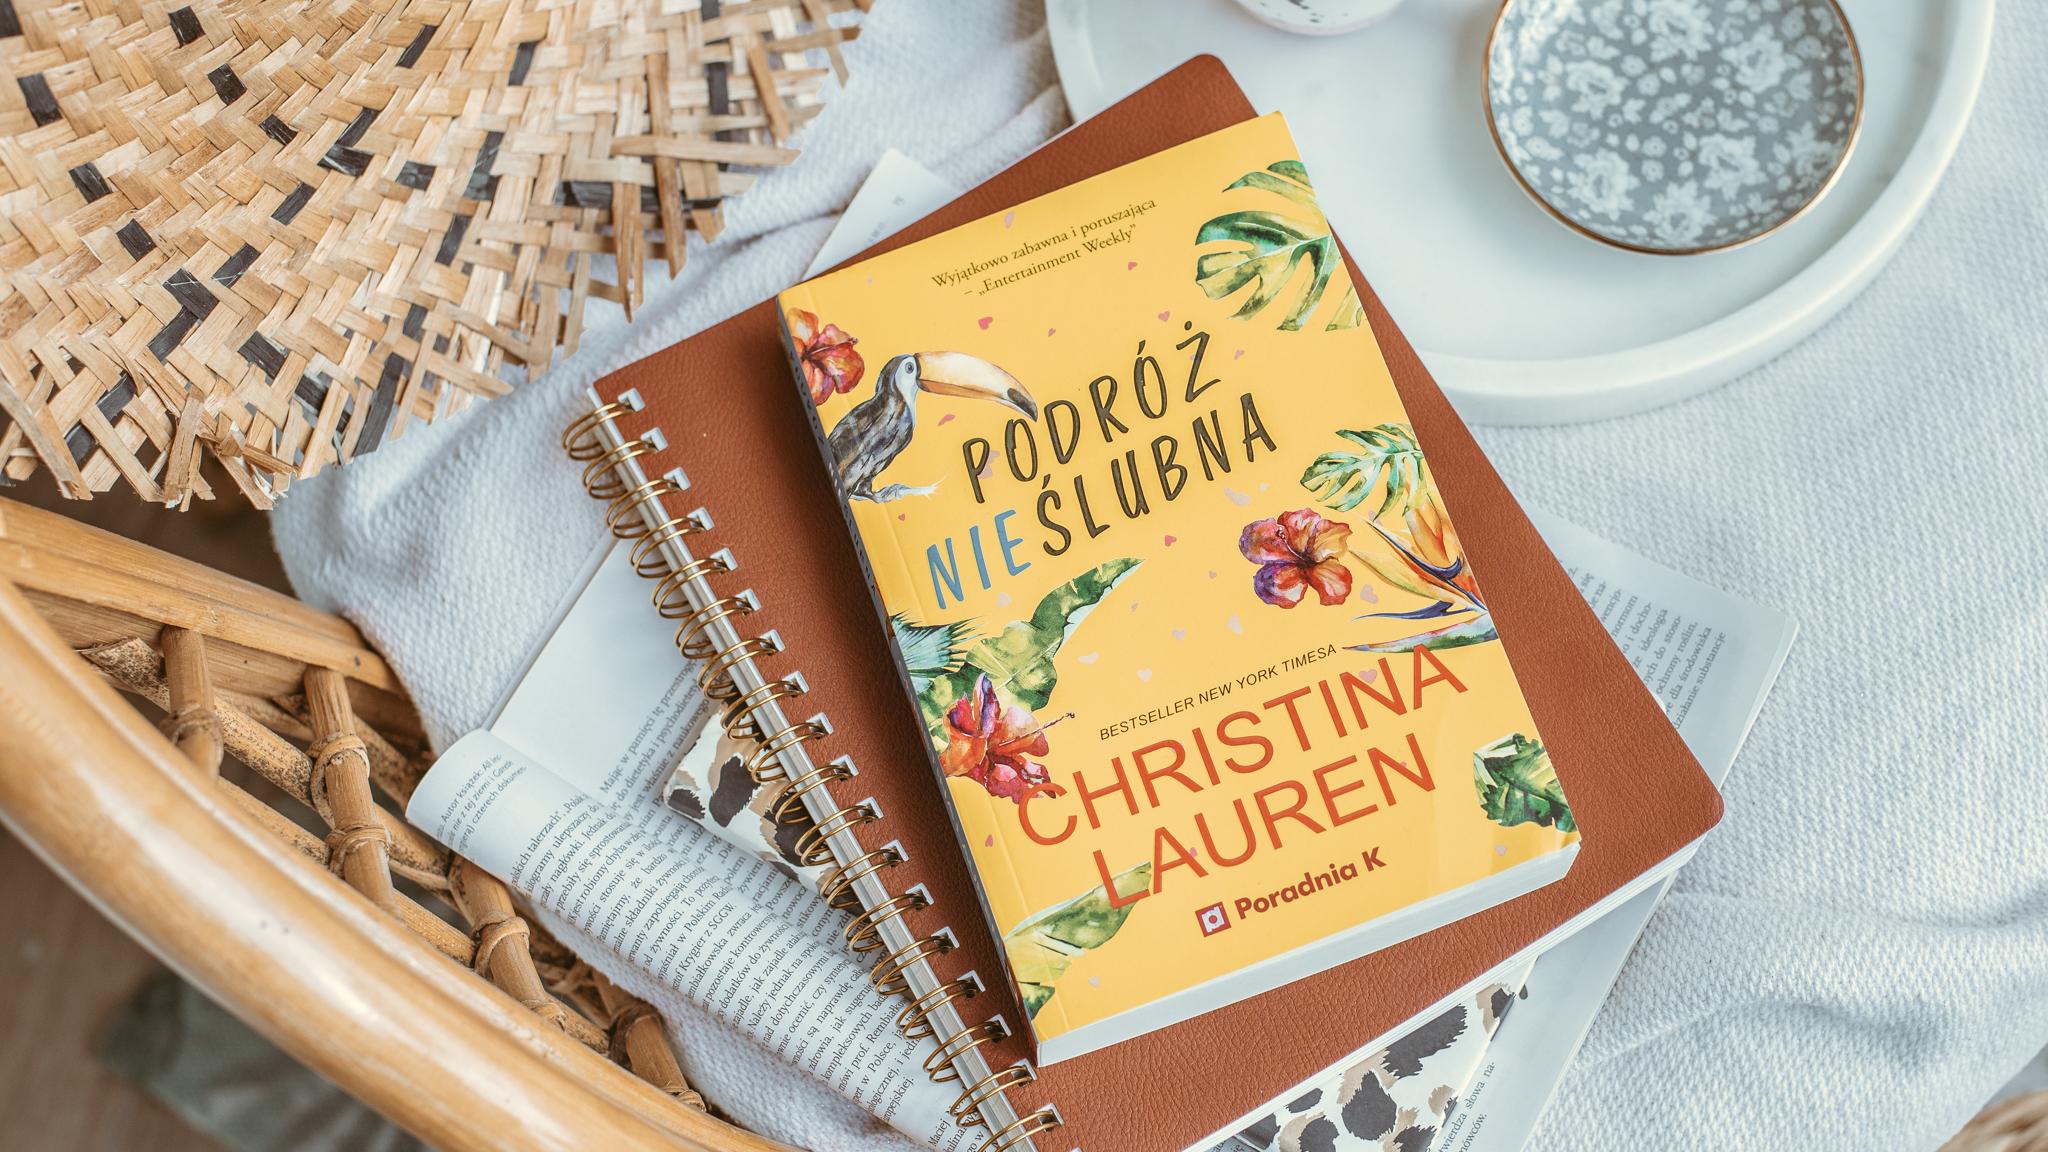 Podróż nieślubna – Christina Lauren